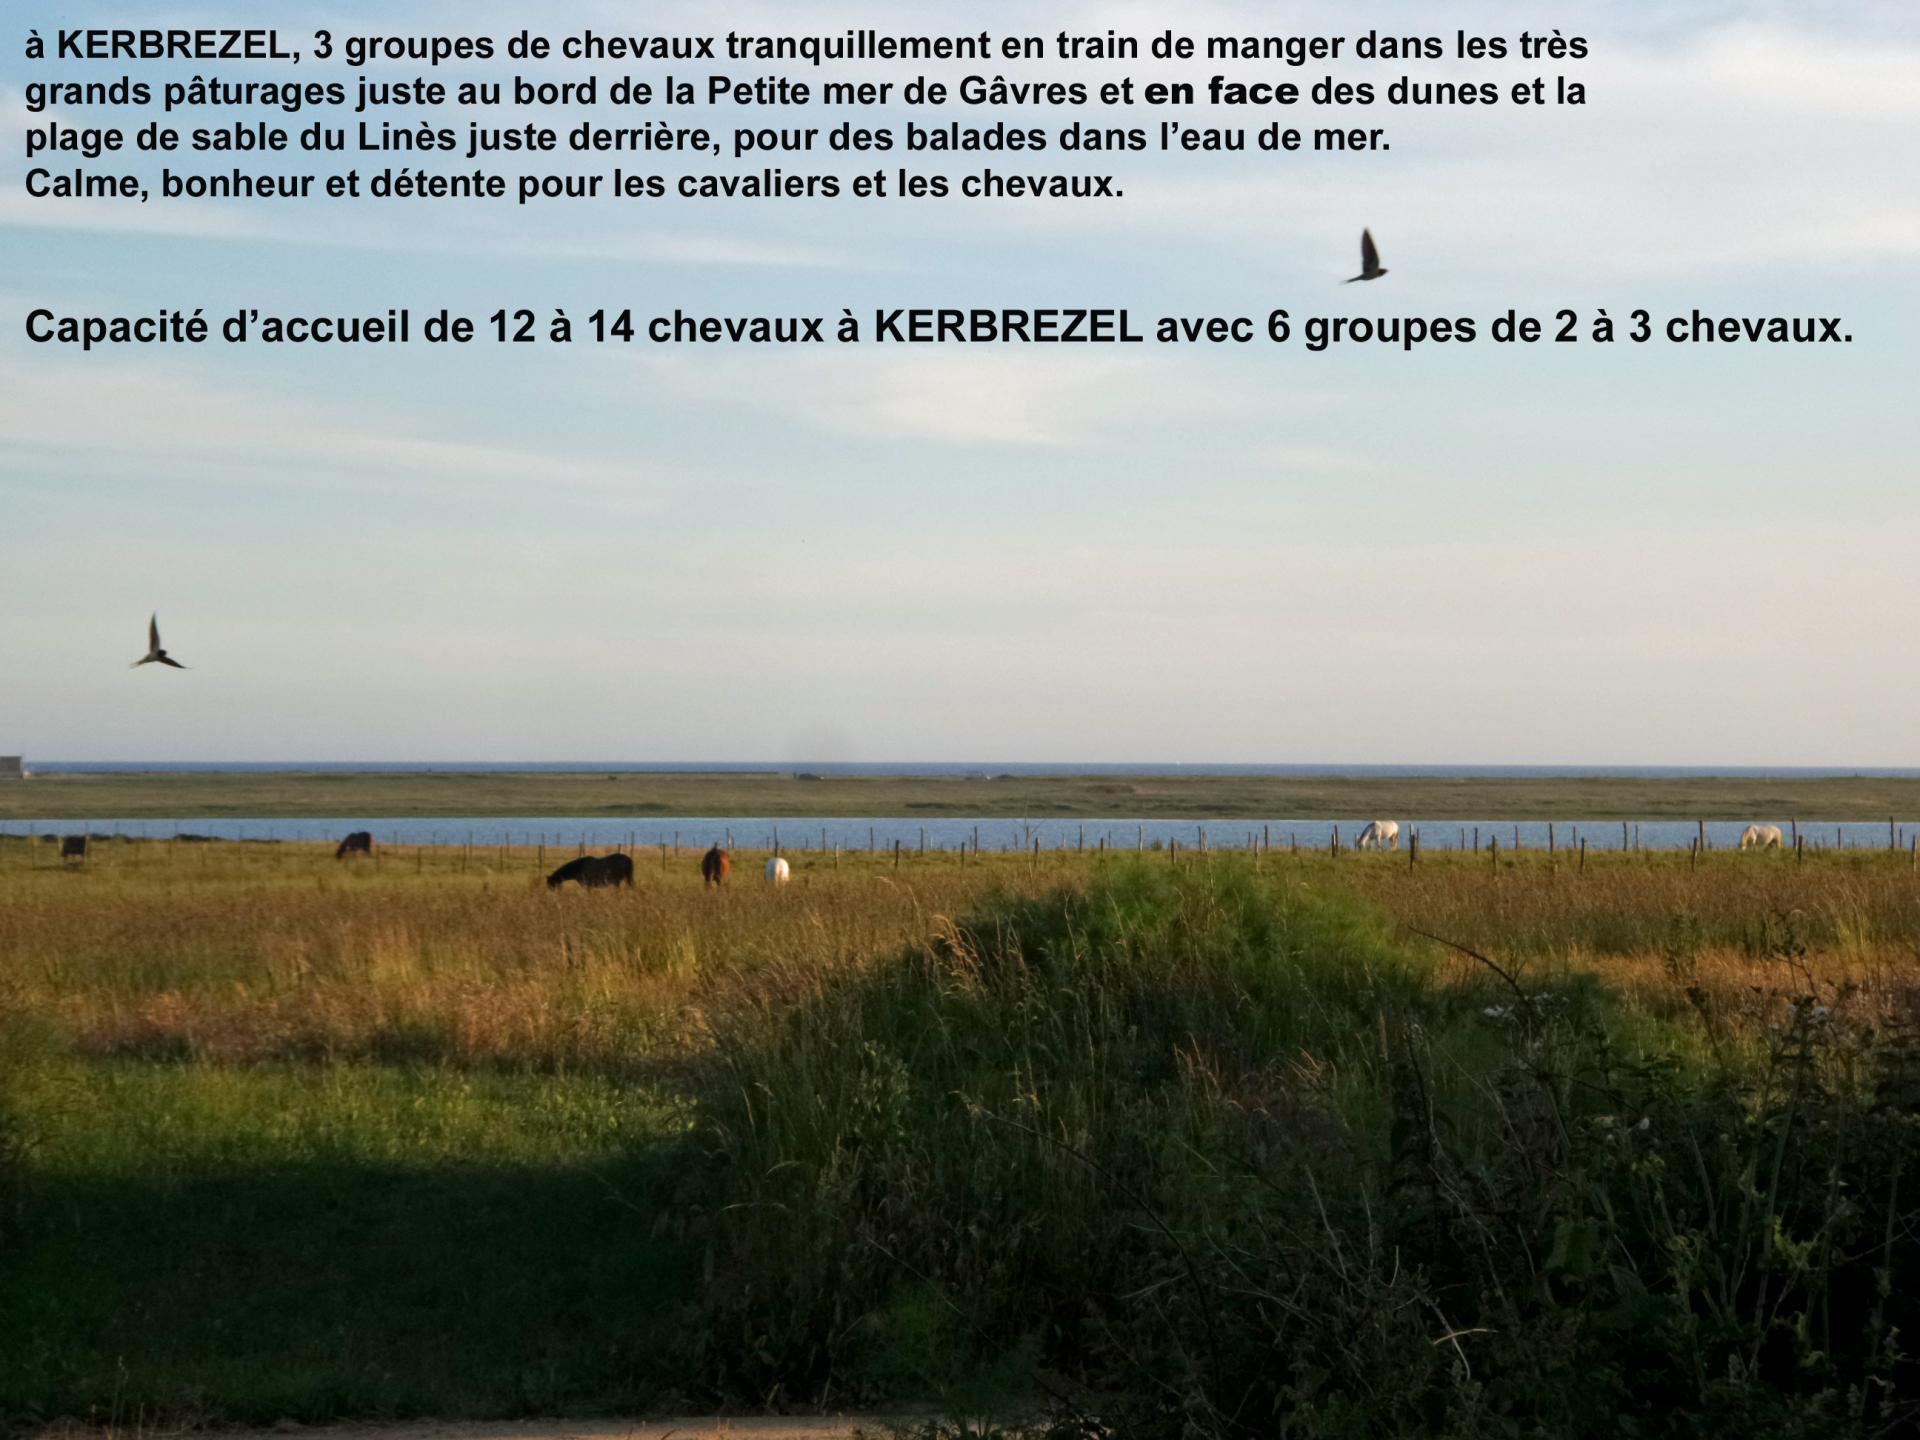 7 chevaux a kerbrezel au bord de la petite mer de gavres 5